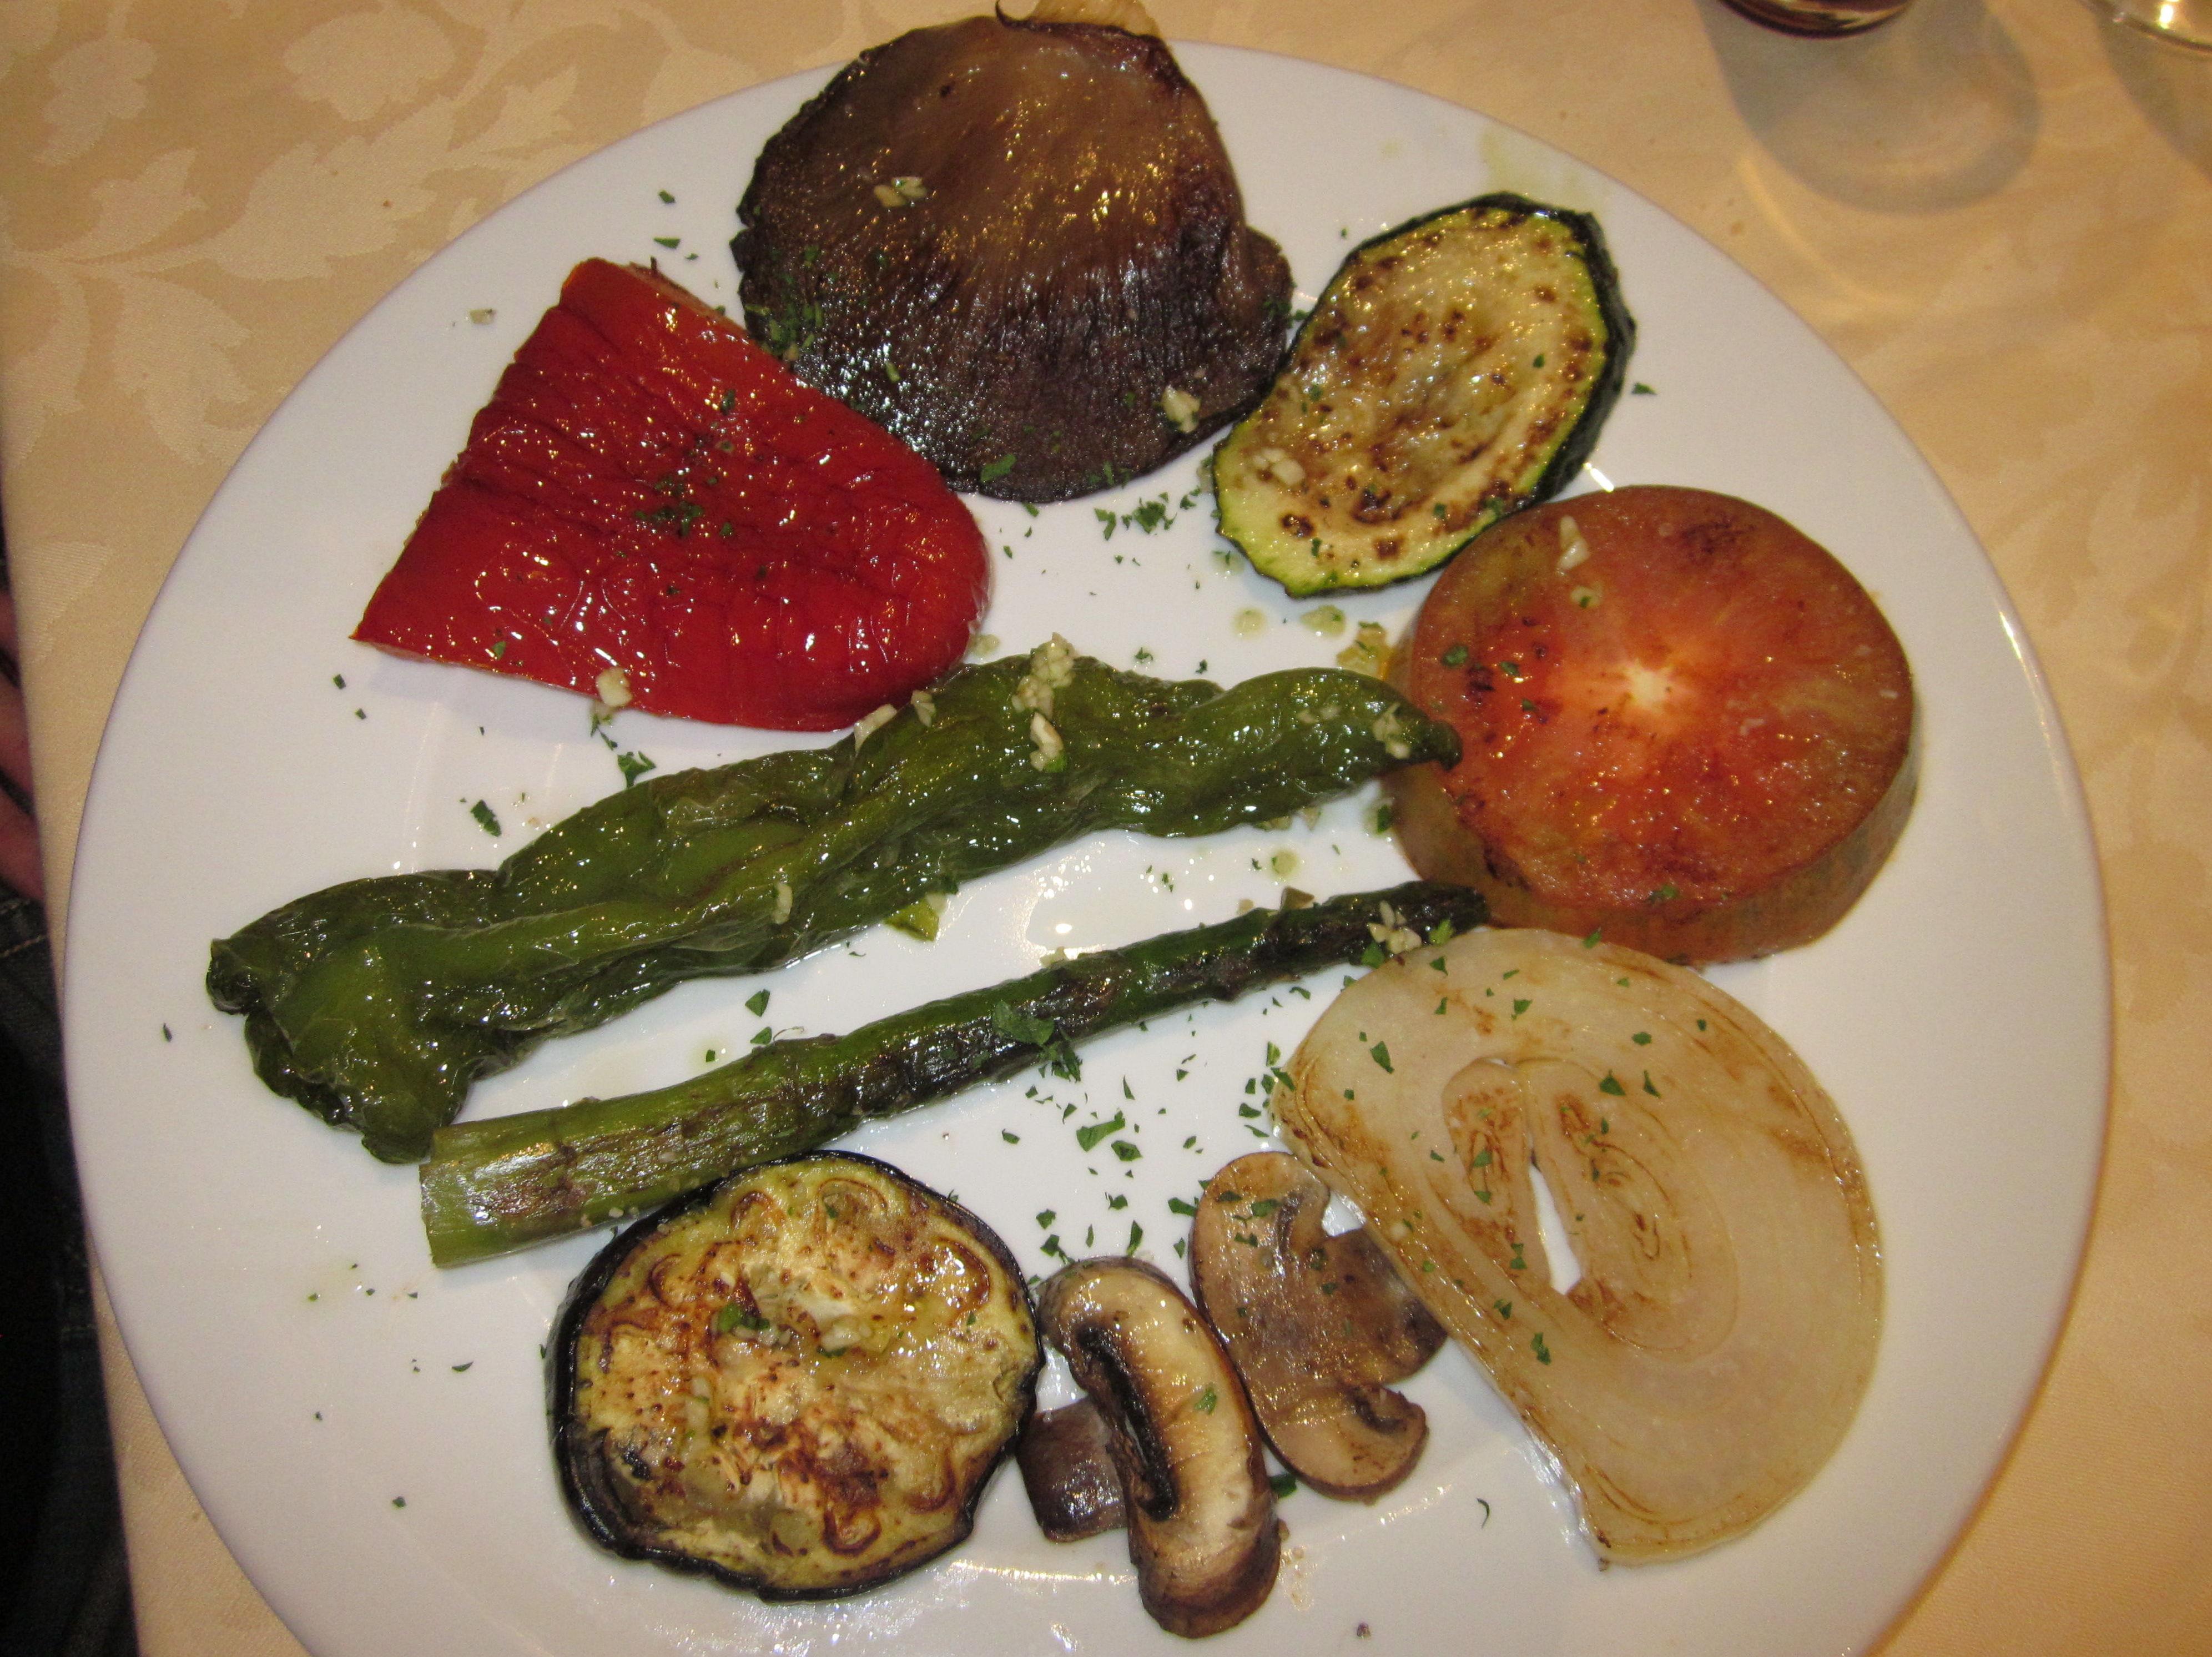 Parrillada de verduras